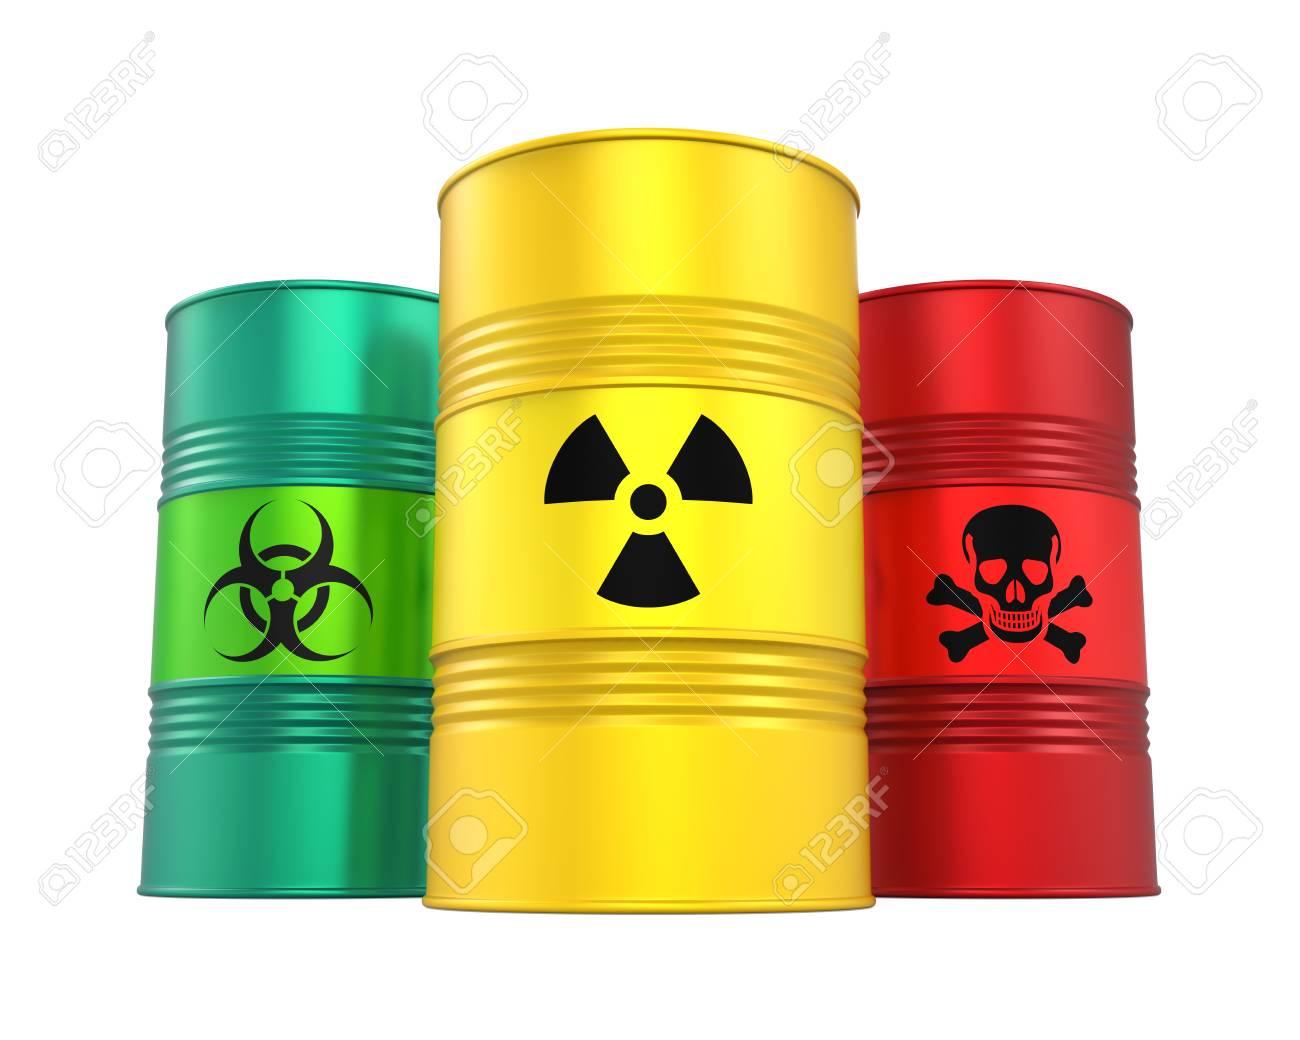 Biohazard, Radioactive and Poisonous Barrels Isolated - 80351200